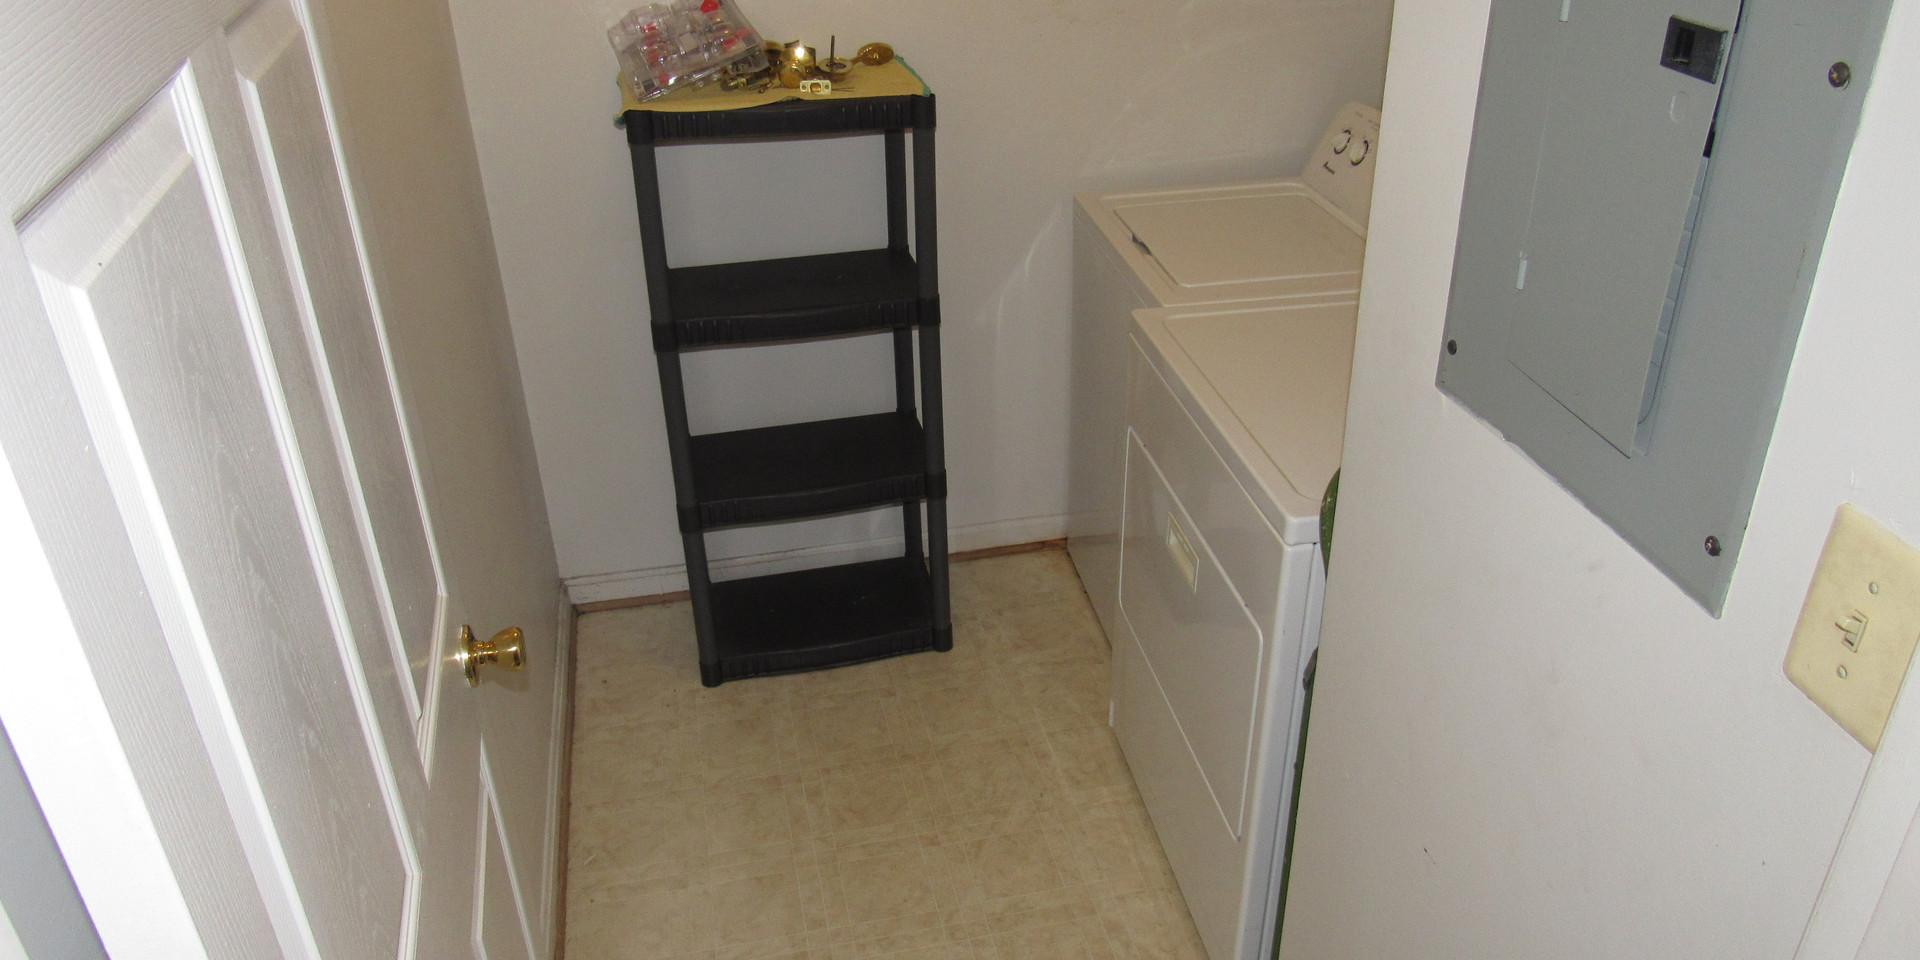 15 - Laundry Room.JPG